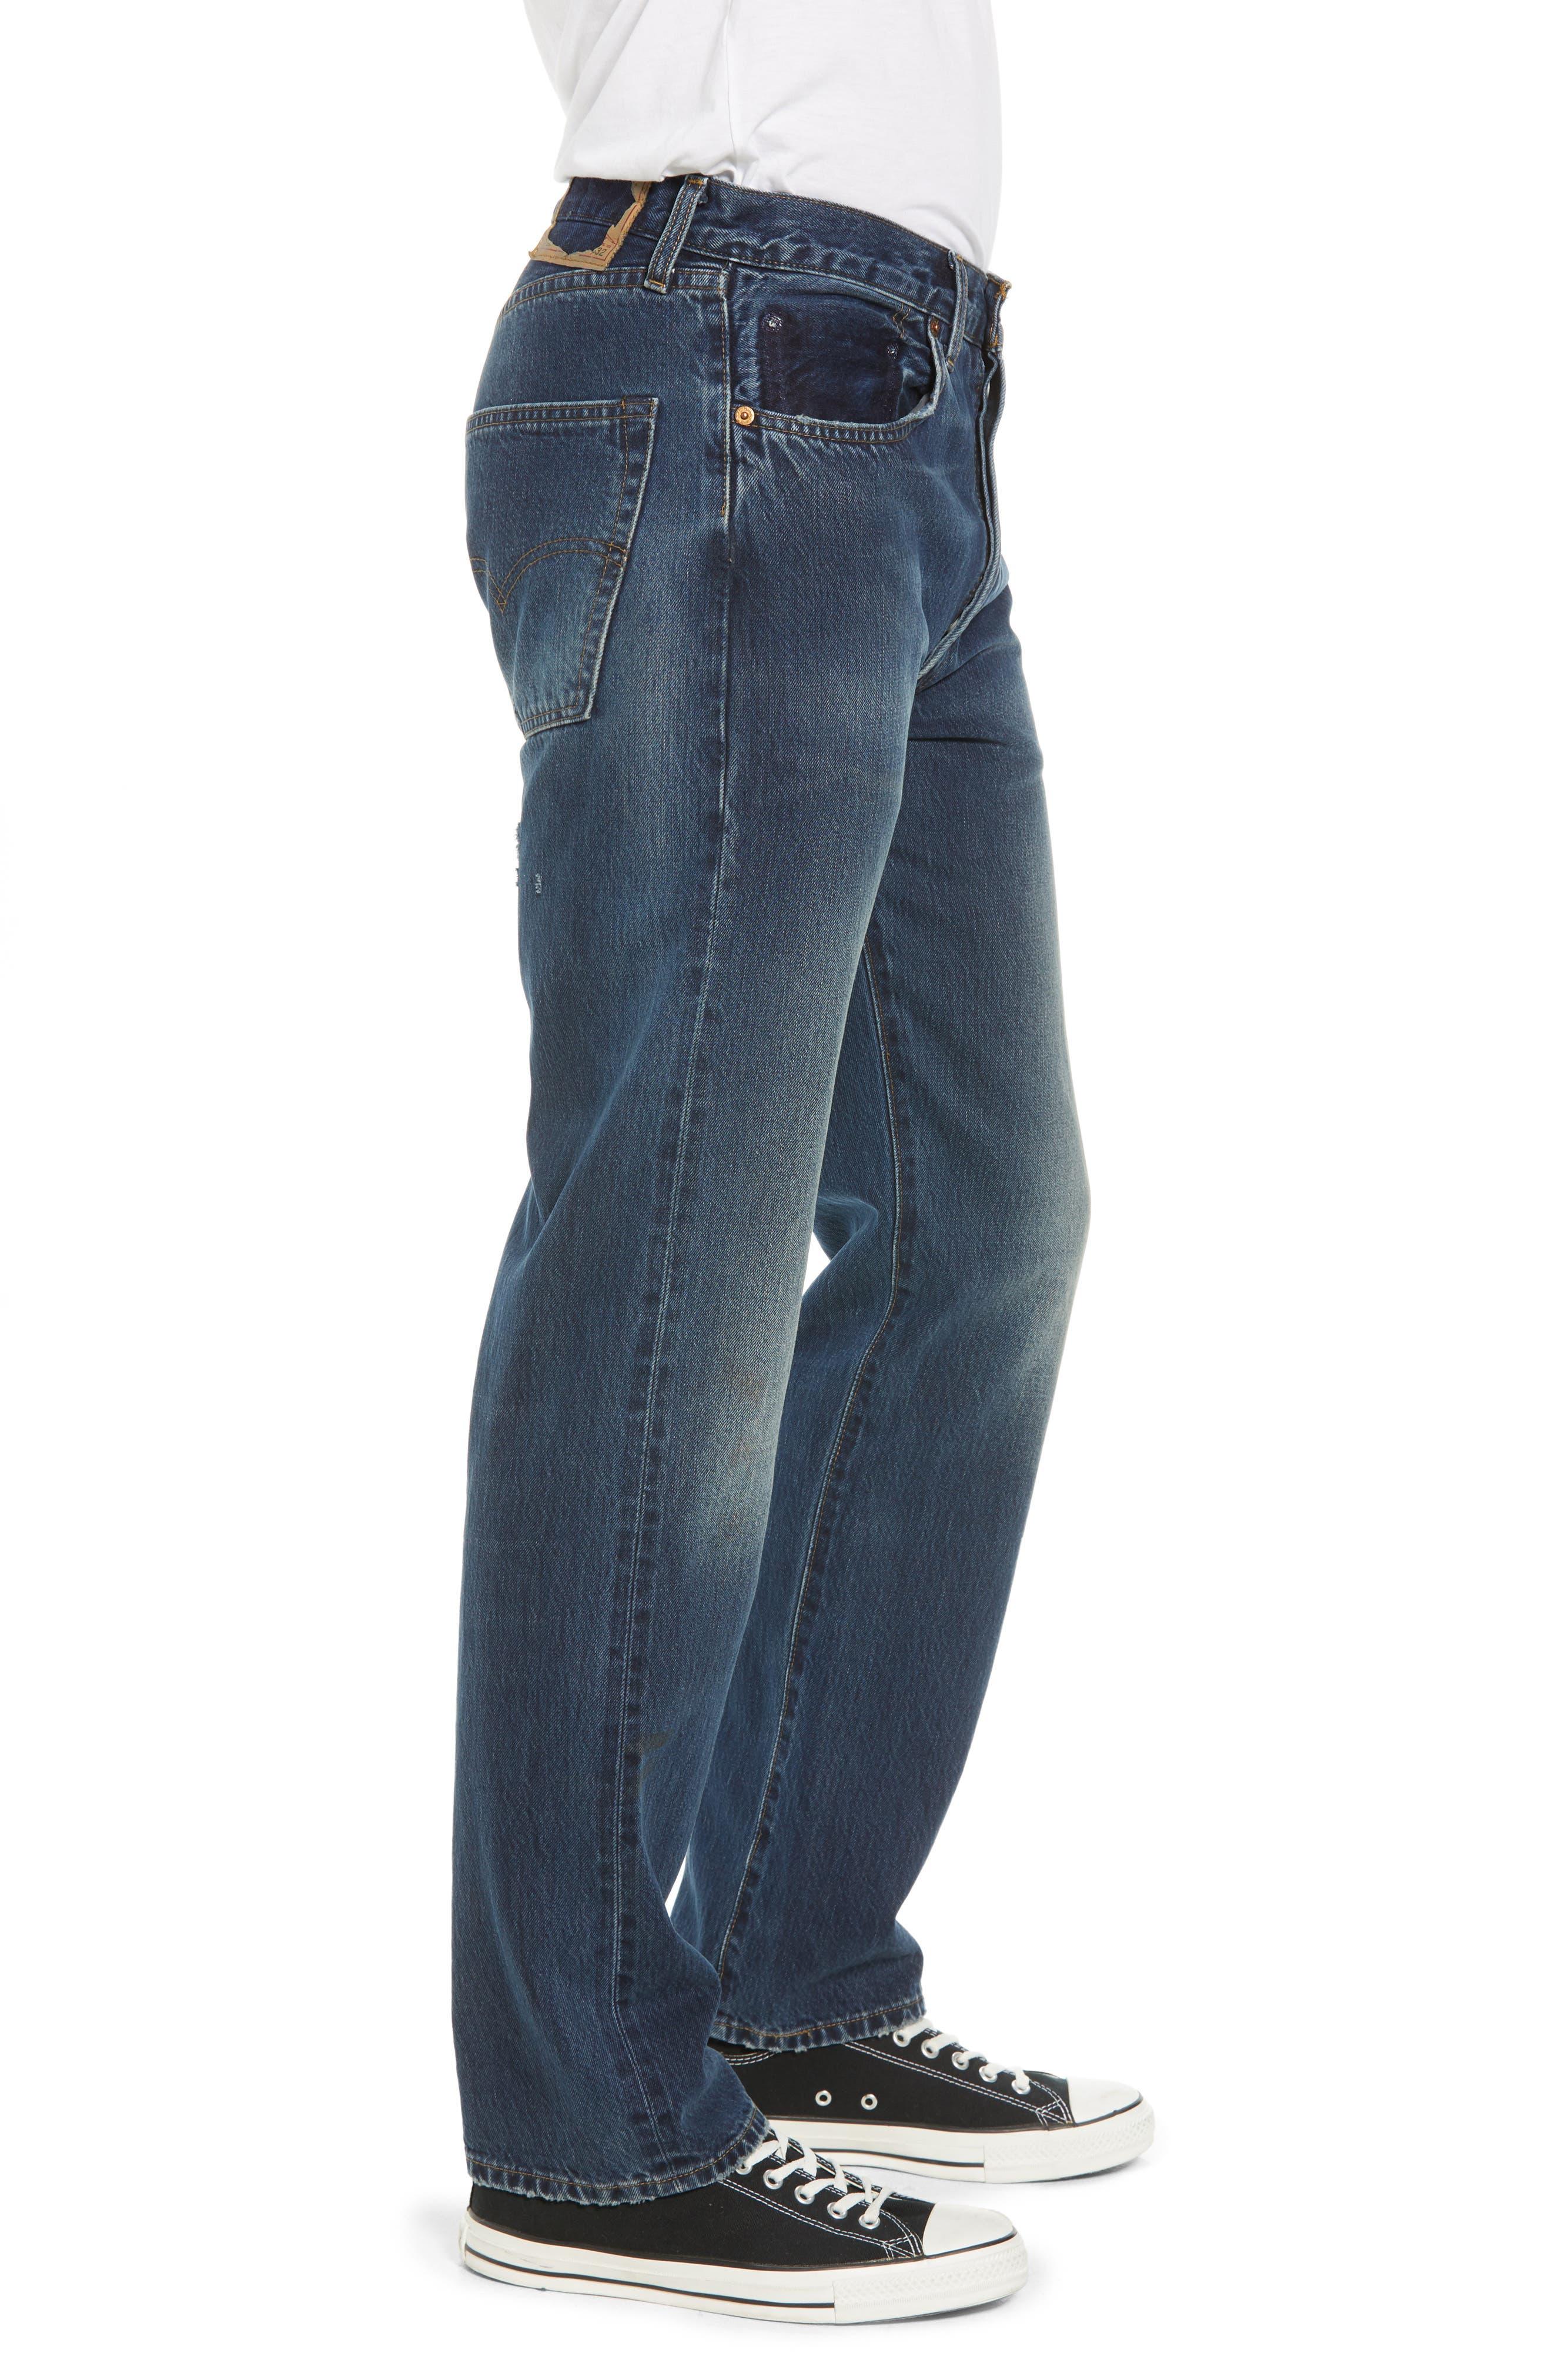 Levi's<sup>®</sup> 1967 501<sup>®</sup> Slim Fit Jeans,                             Alternate thumbnail 3, color,                             402